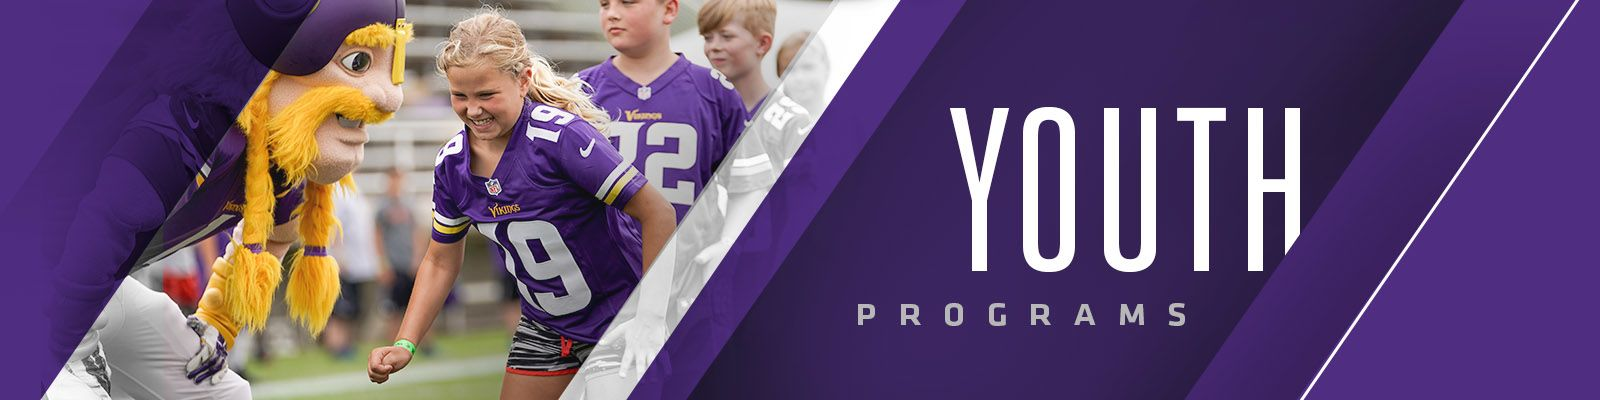 YouthPrograms_1600x400